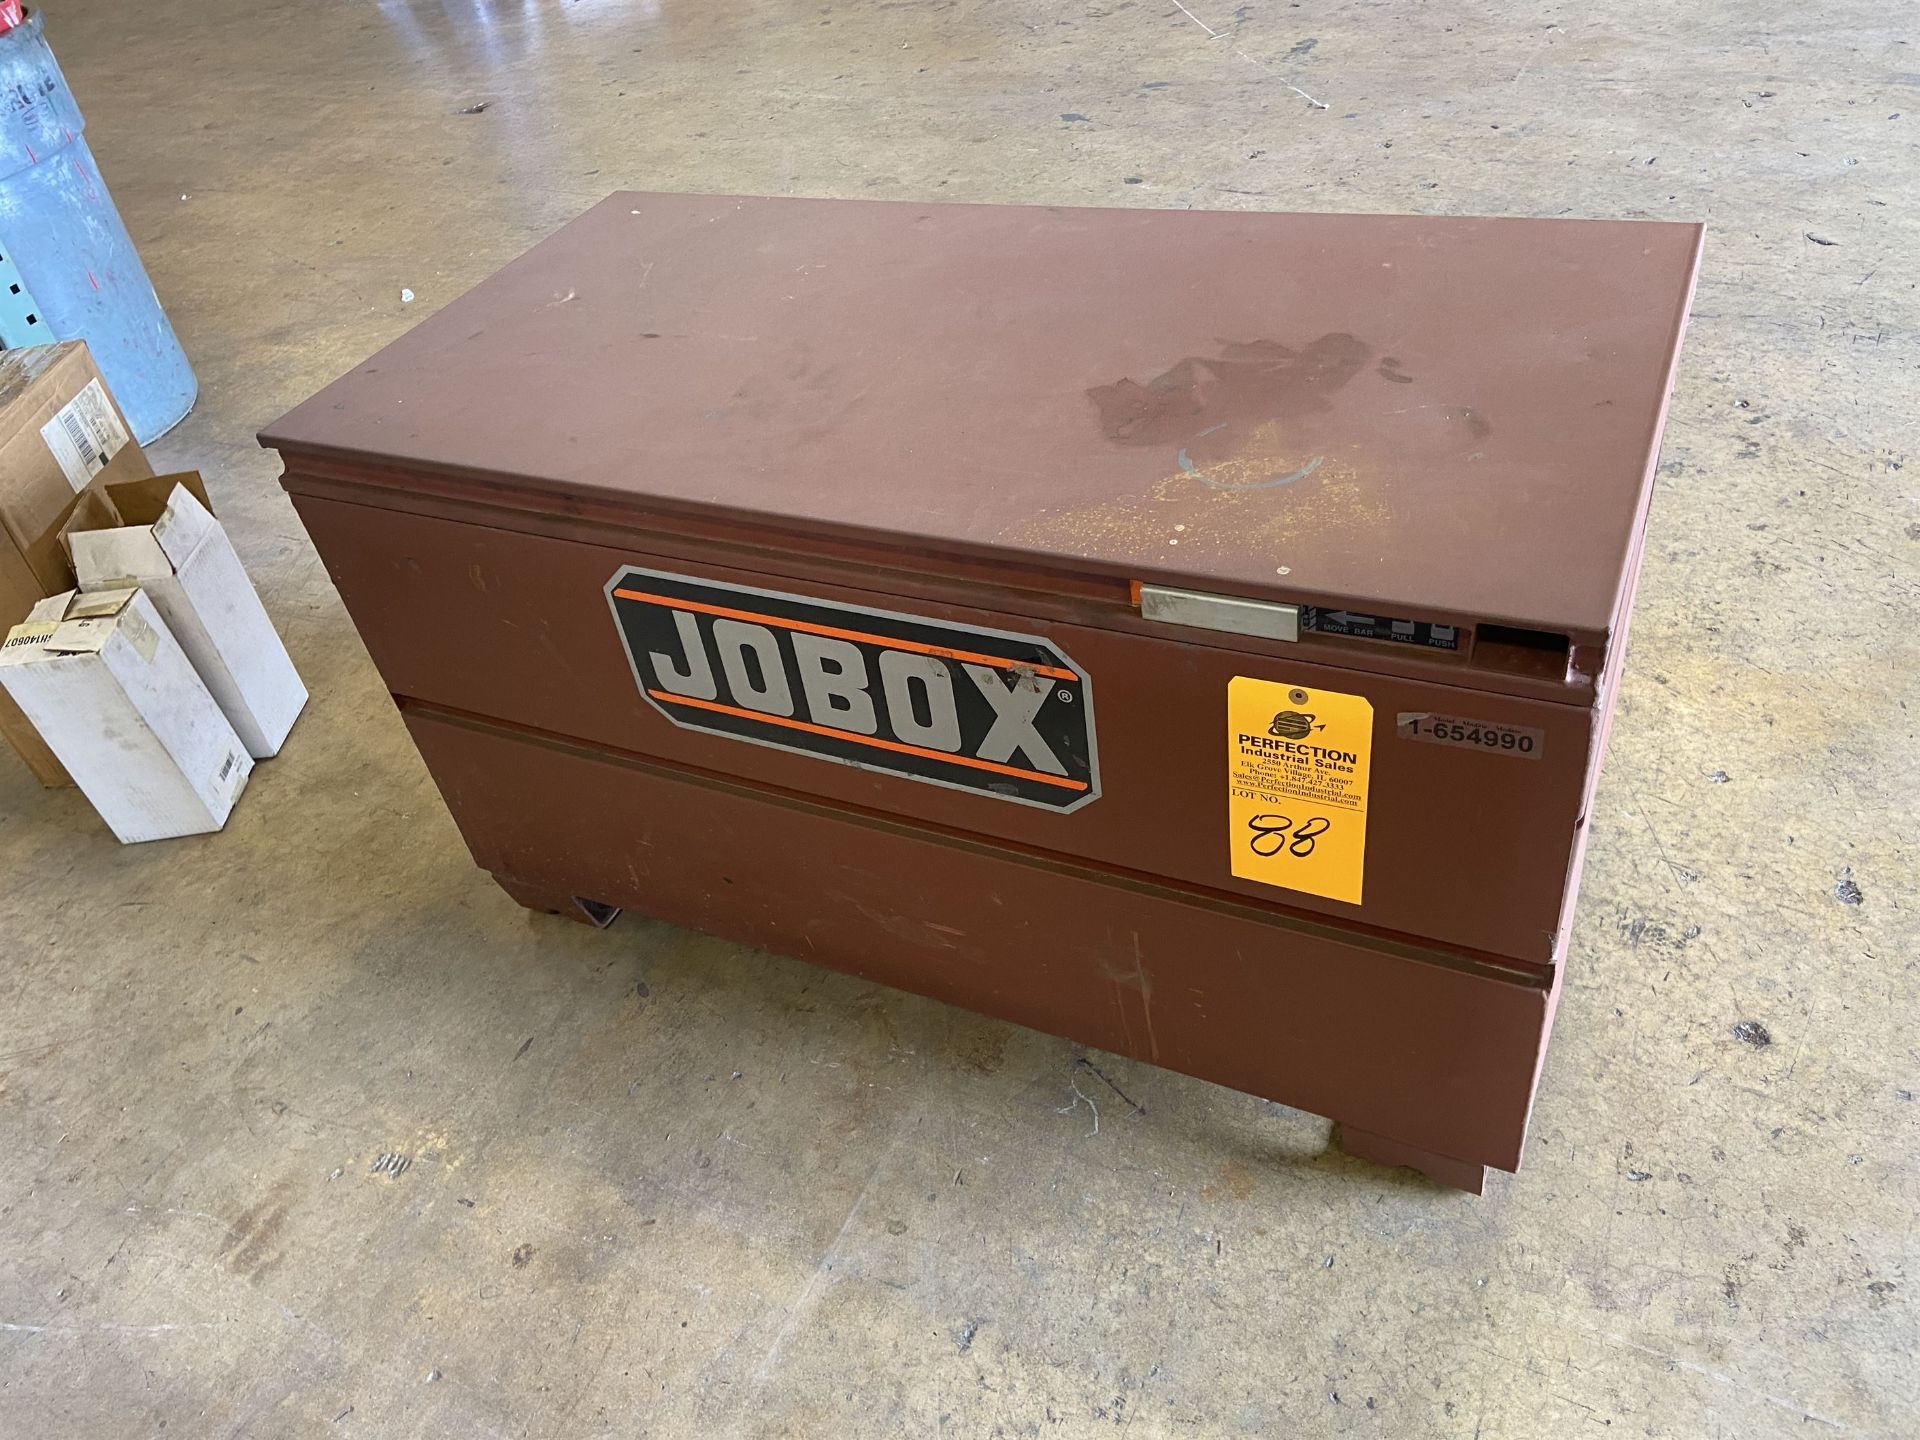 Jobox Model 1-654990